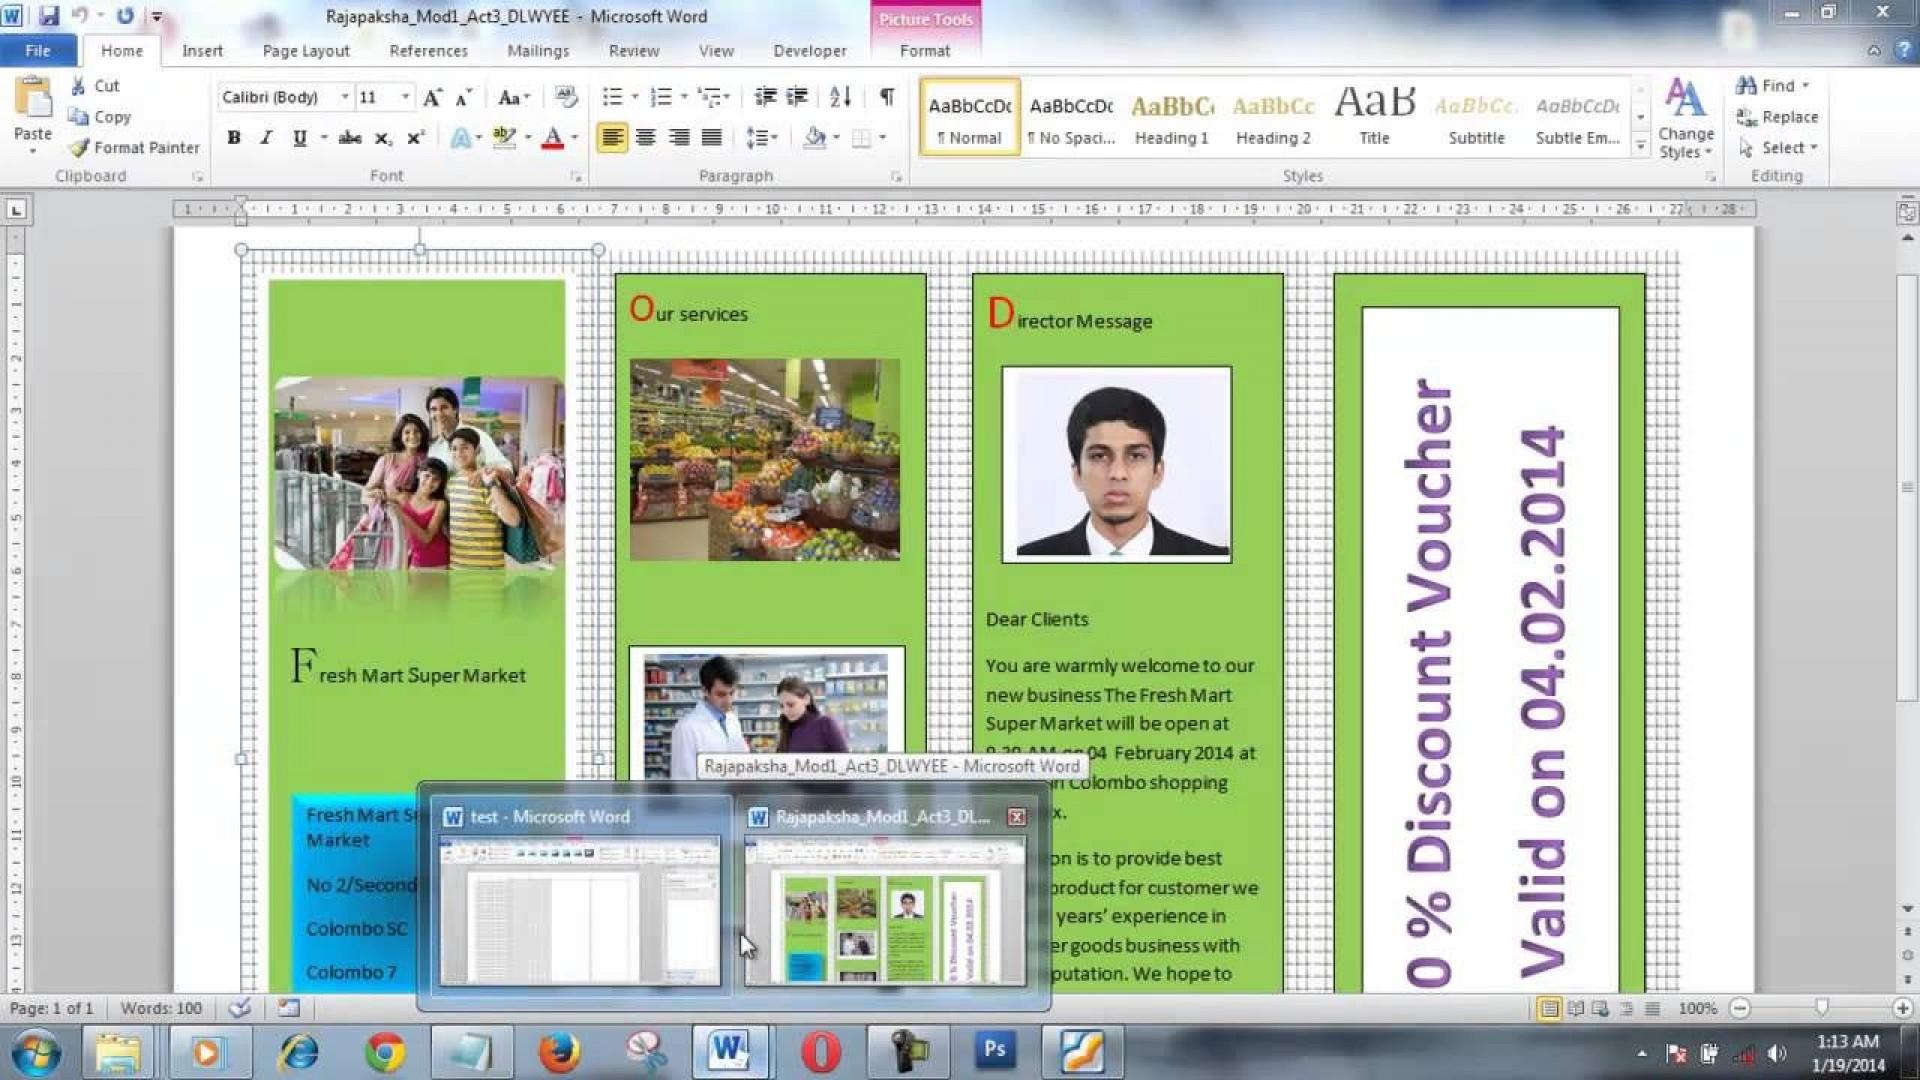 004 Wonderful Brochure Layout M Word Inspiration  Microsoft Funeral Template1920